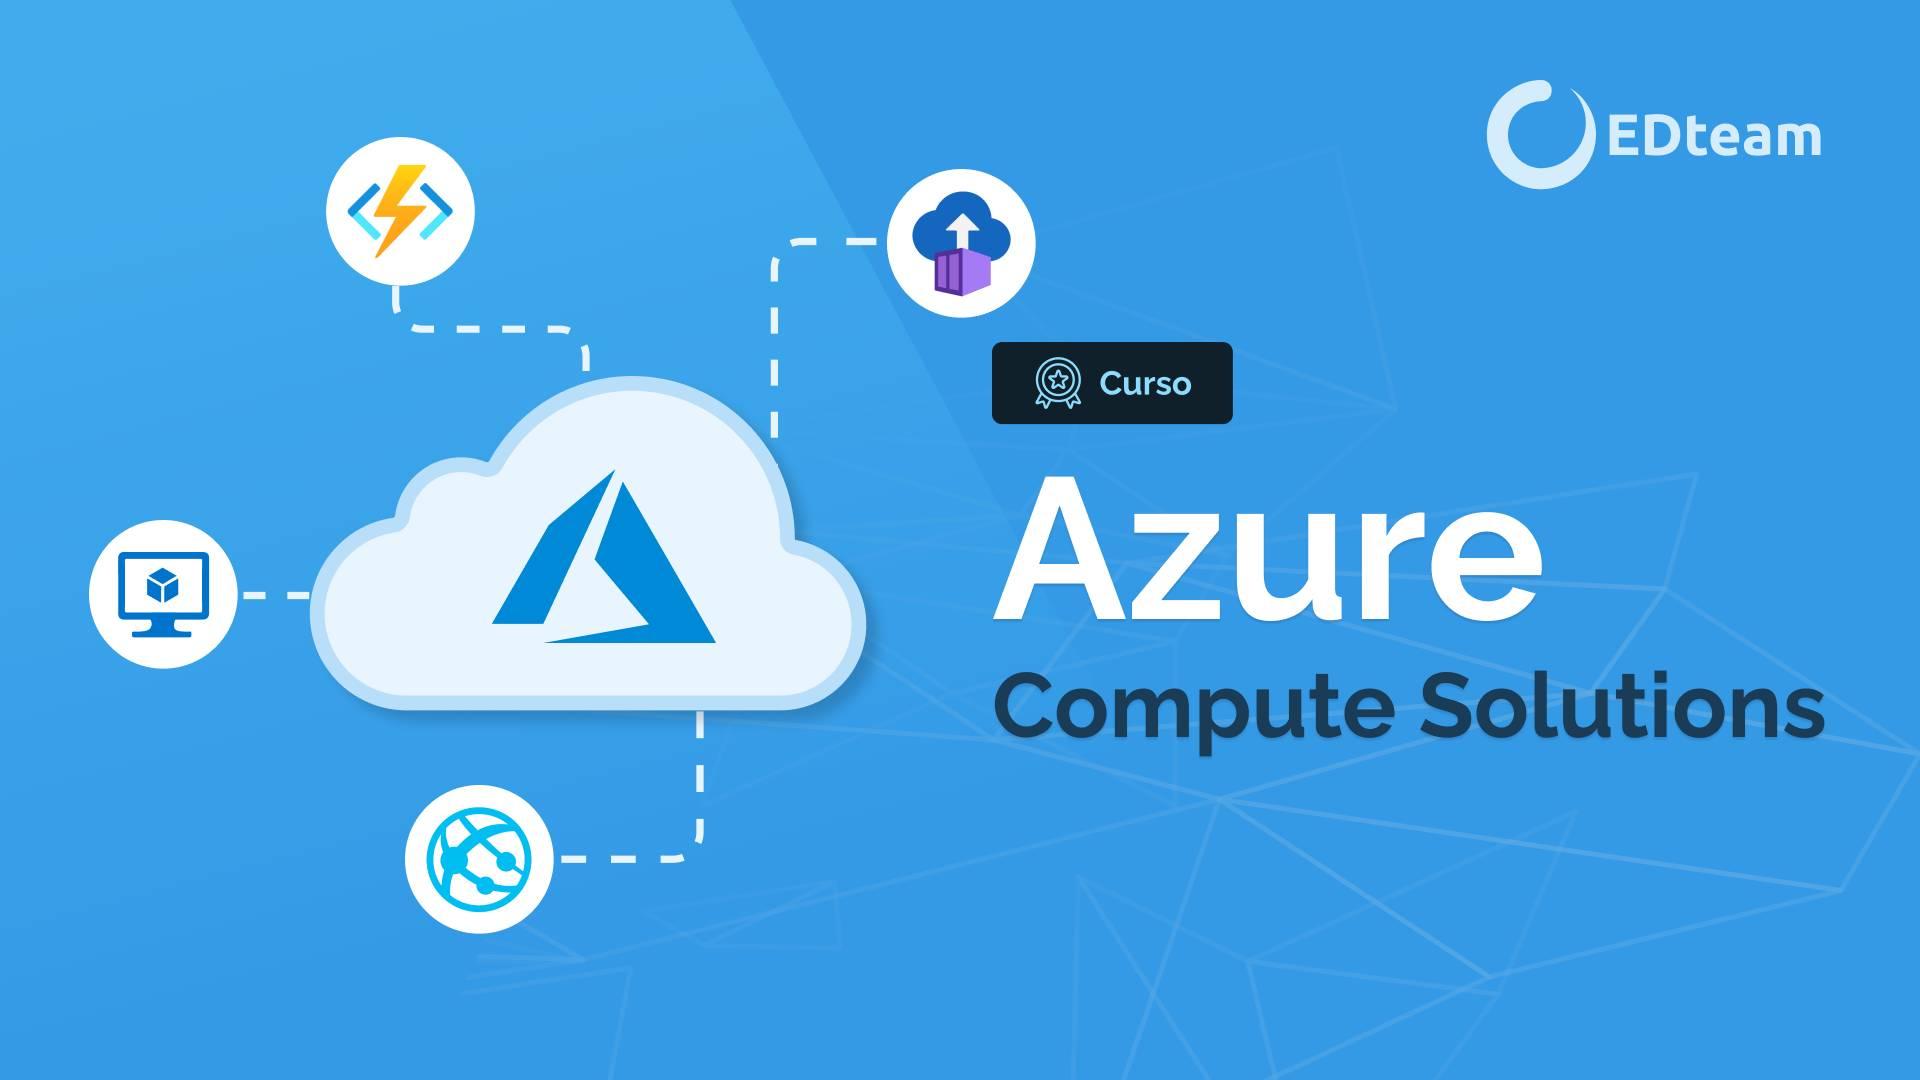 Azure Compute Solutions